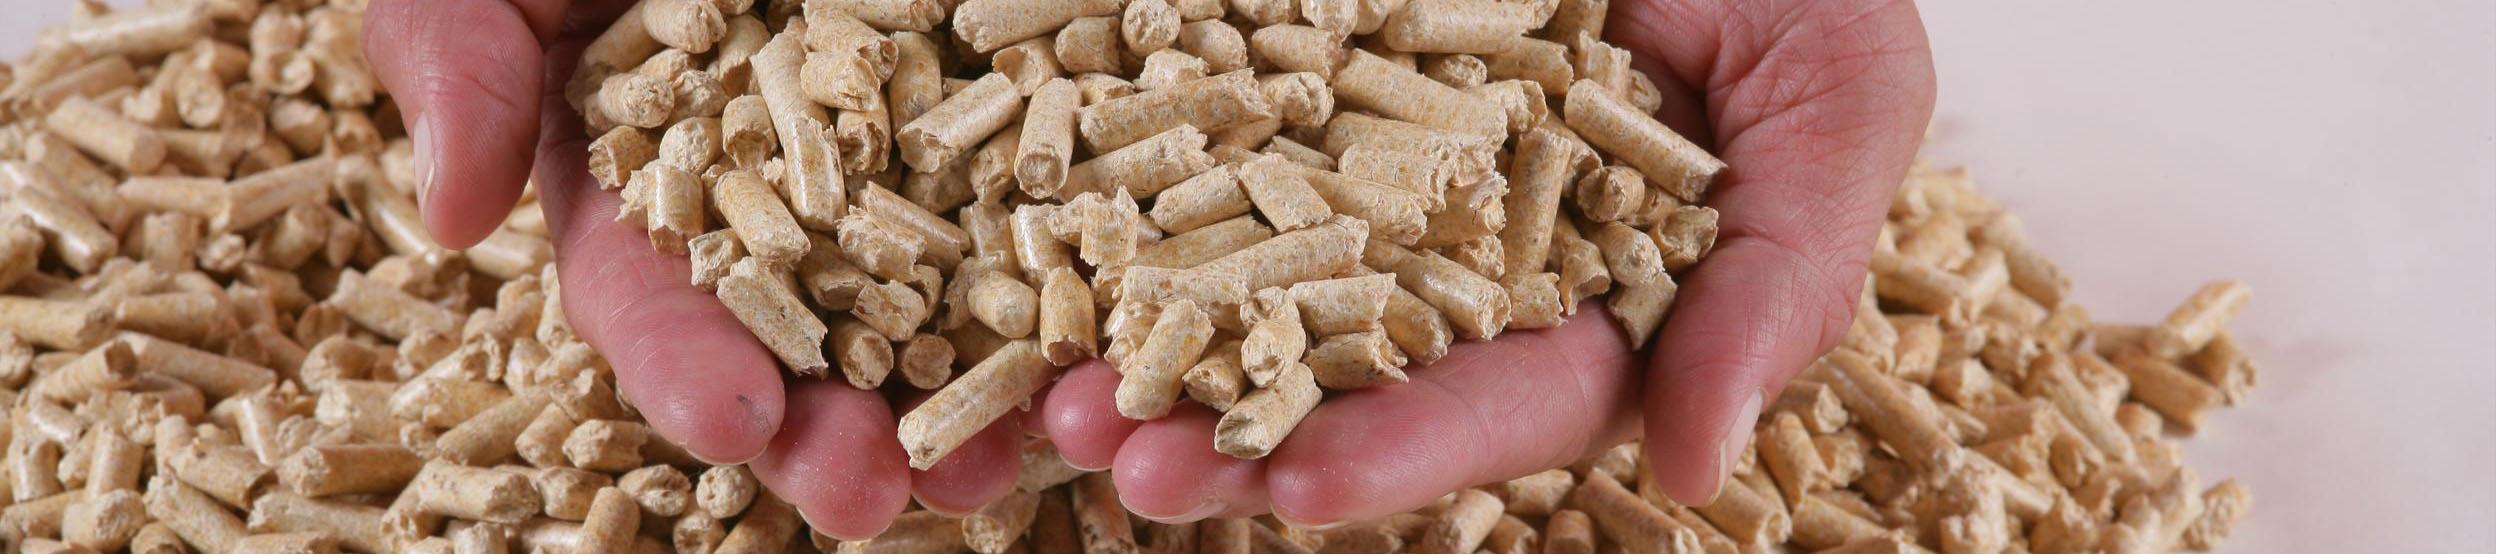 C mo elegir estufa de pellets - Precio kilo pellets ...